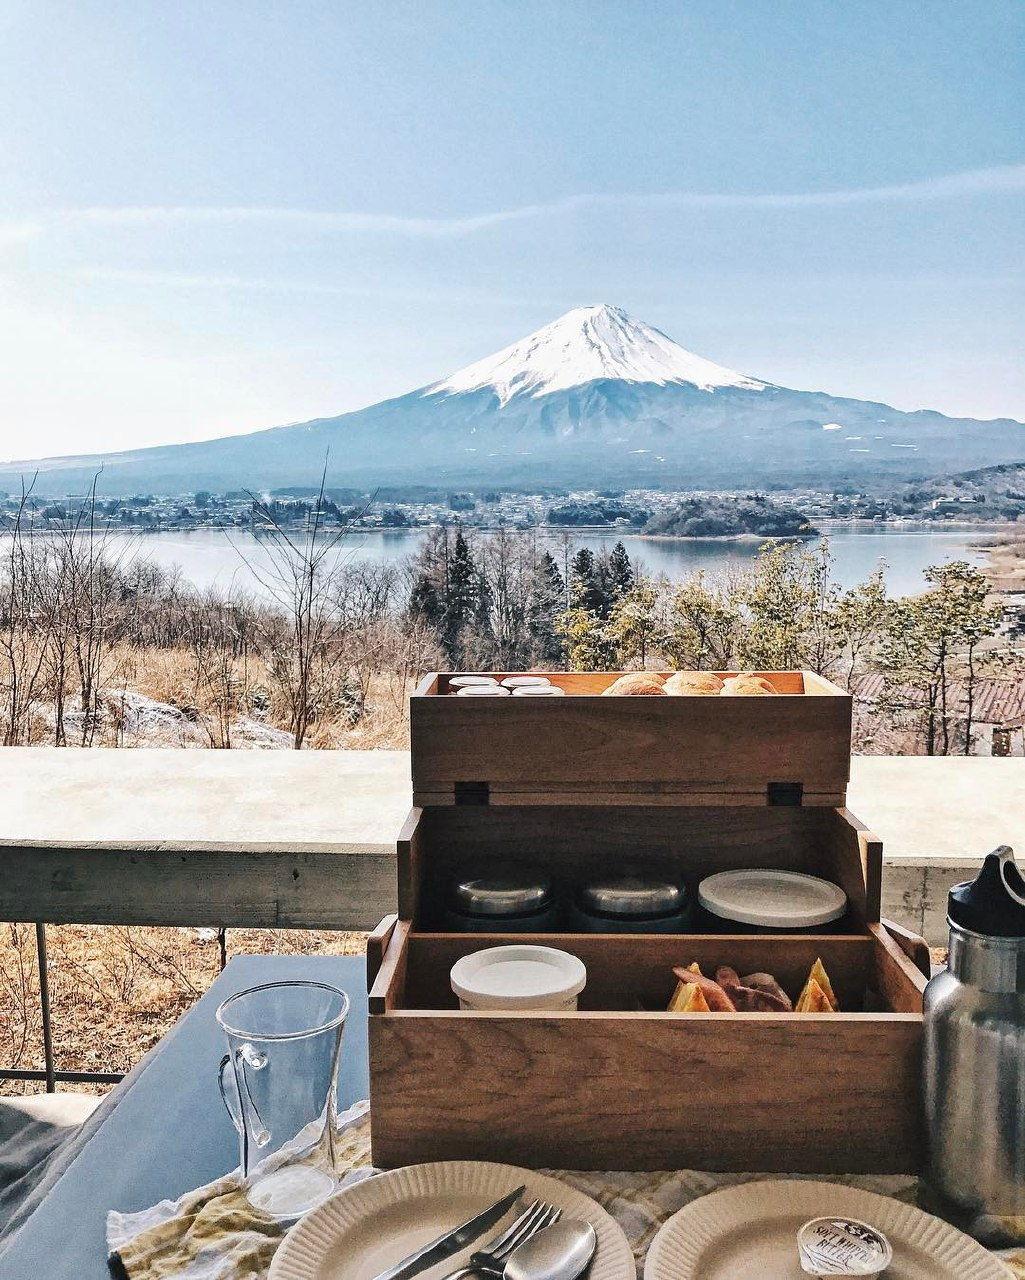 Hoshinoya Fuji glamping